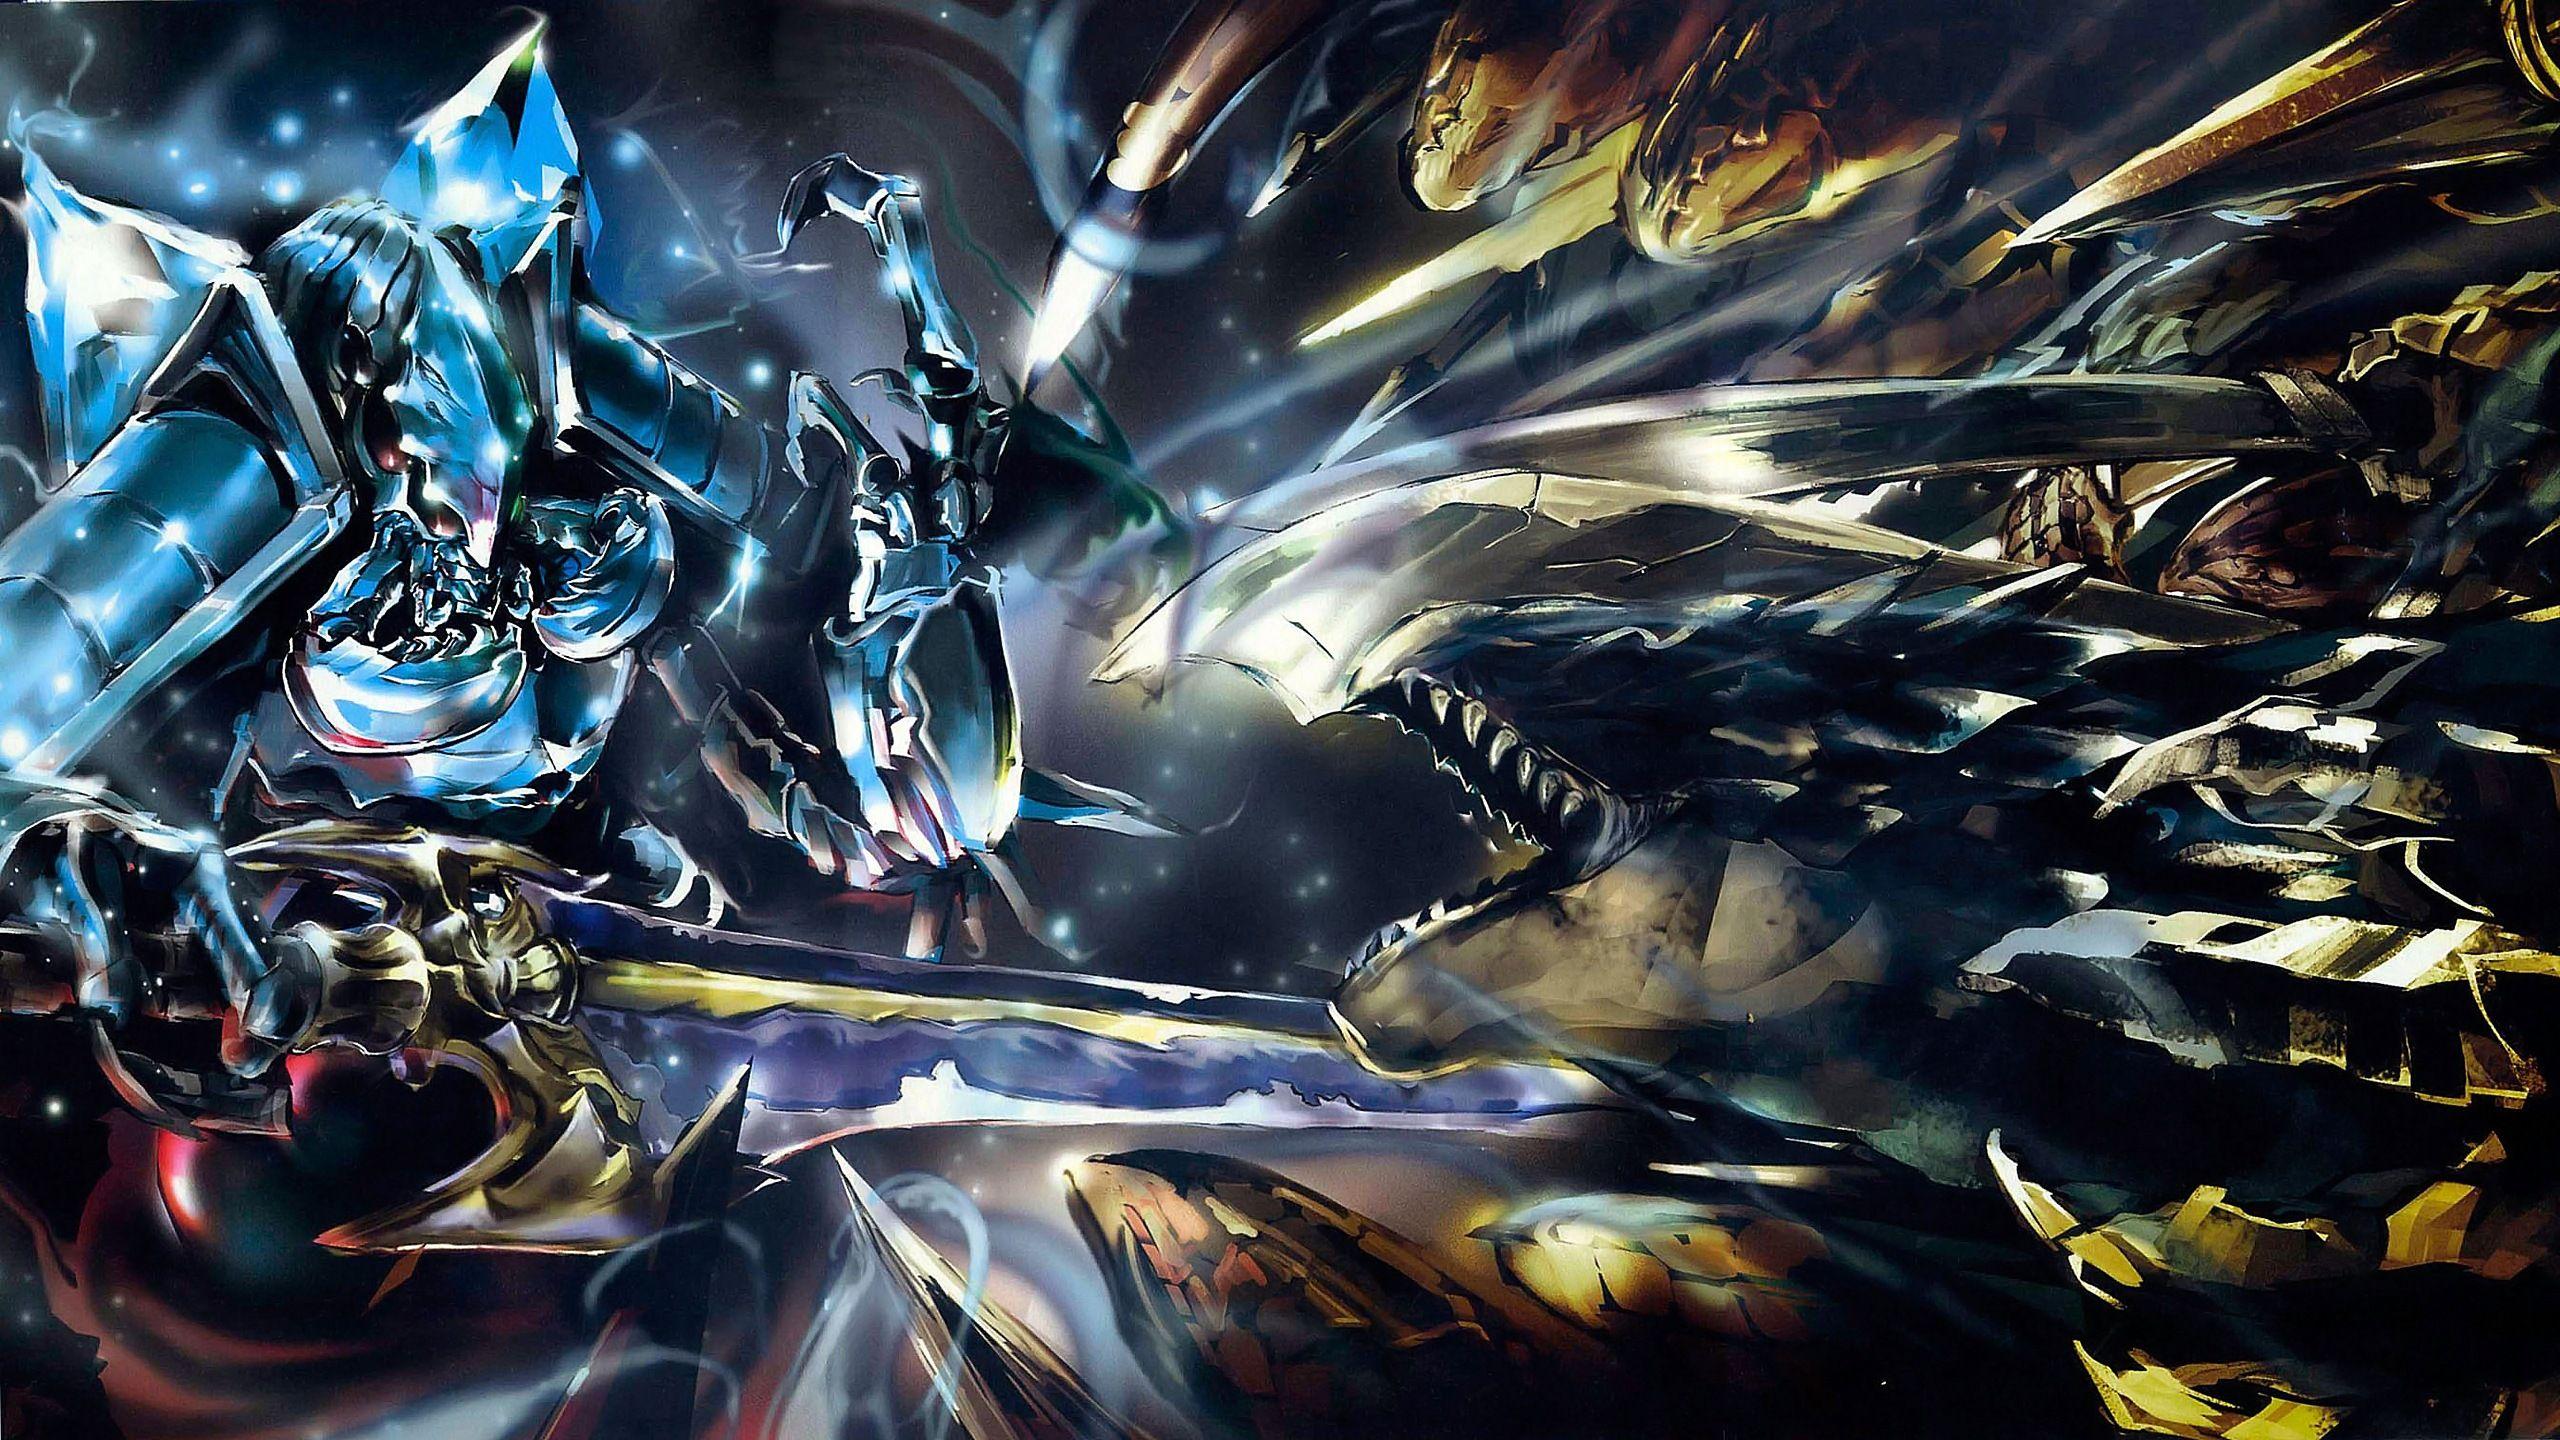 Anime Overlord Overlord Cocytus Lizardman Wallpaper